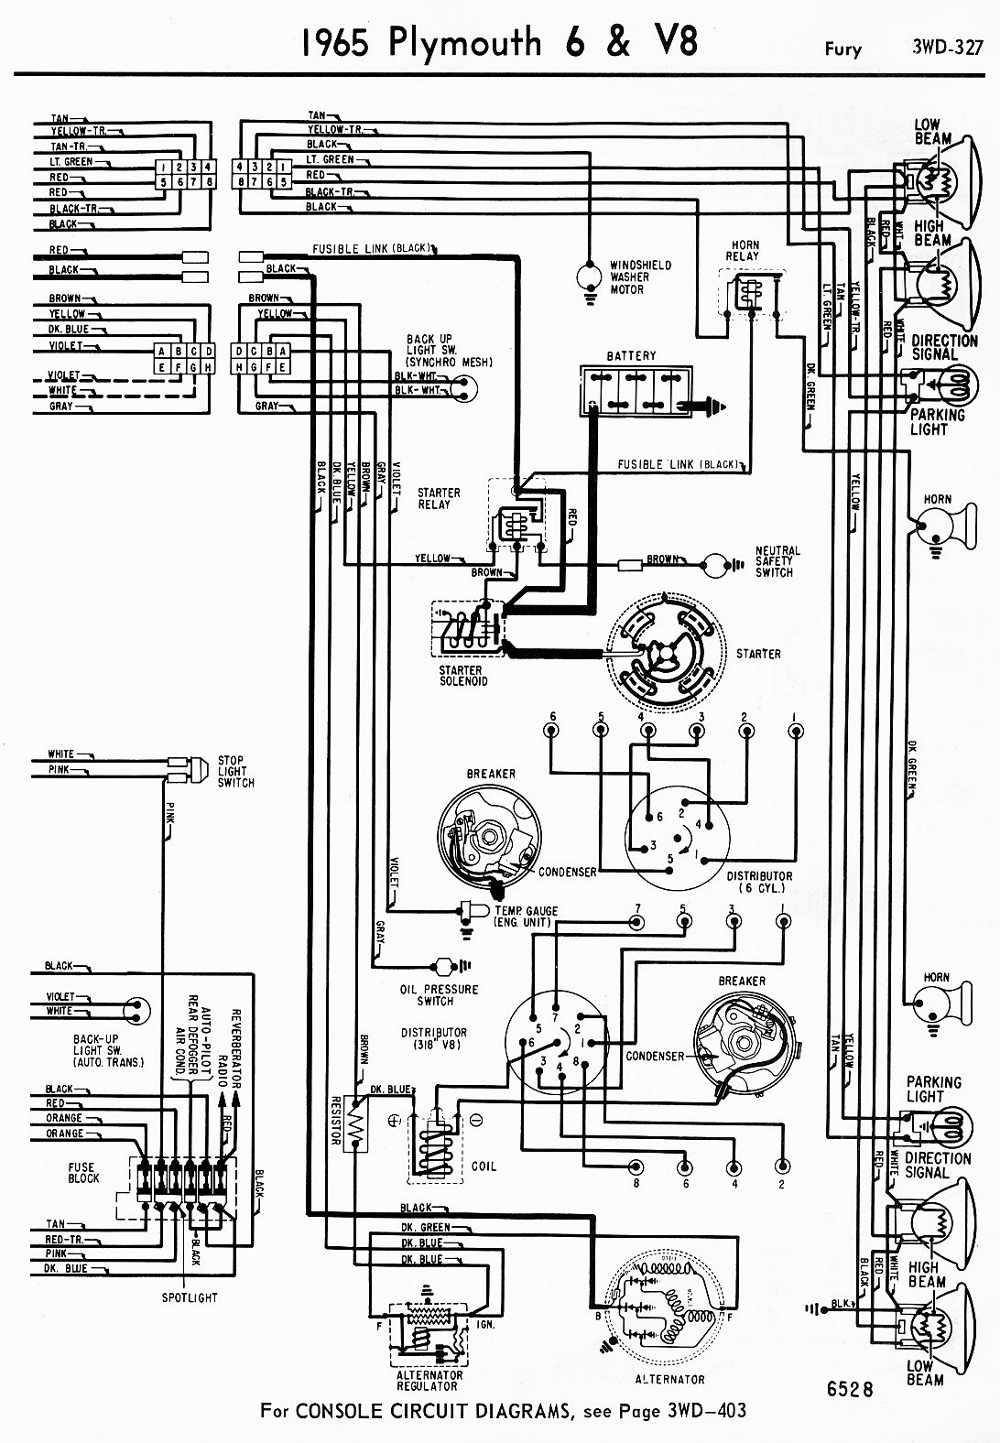 medium resolution of 1966 plymouth wiring diagram wiring schematic 1971 nova door parts diagram 1967 plymouth wiring diagram wiring